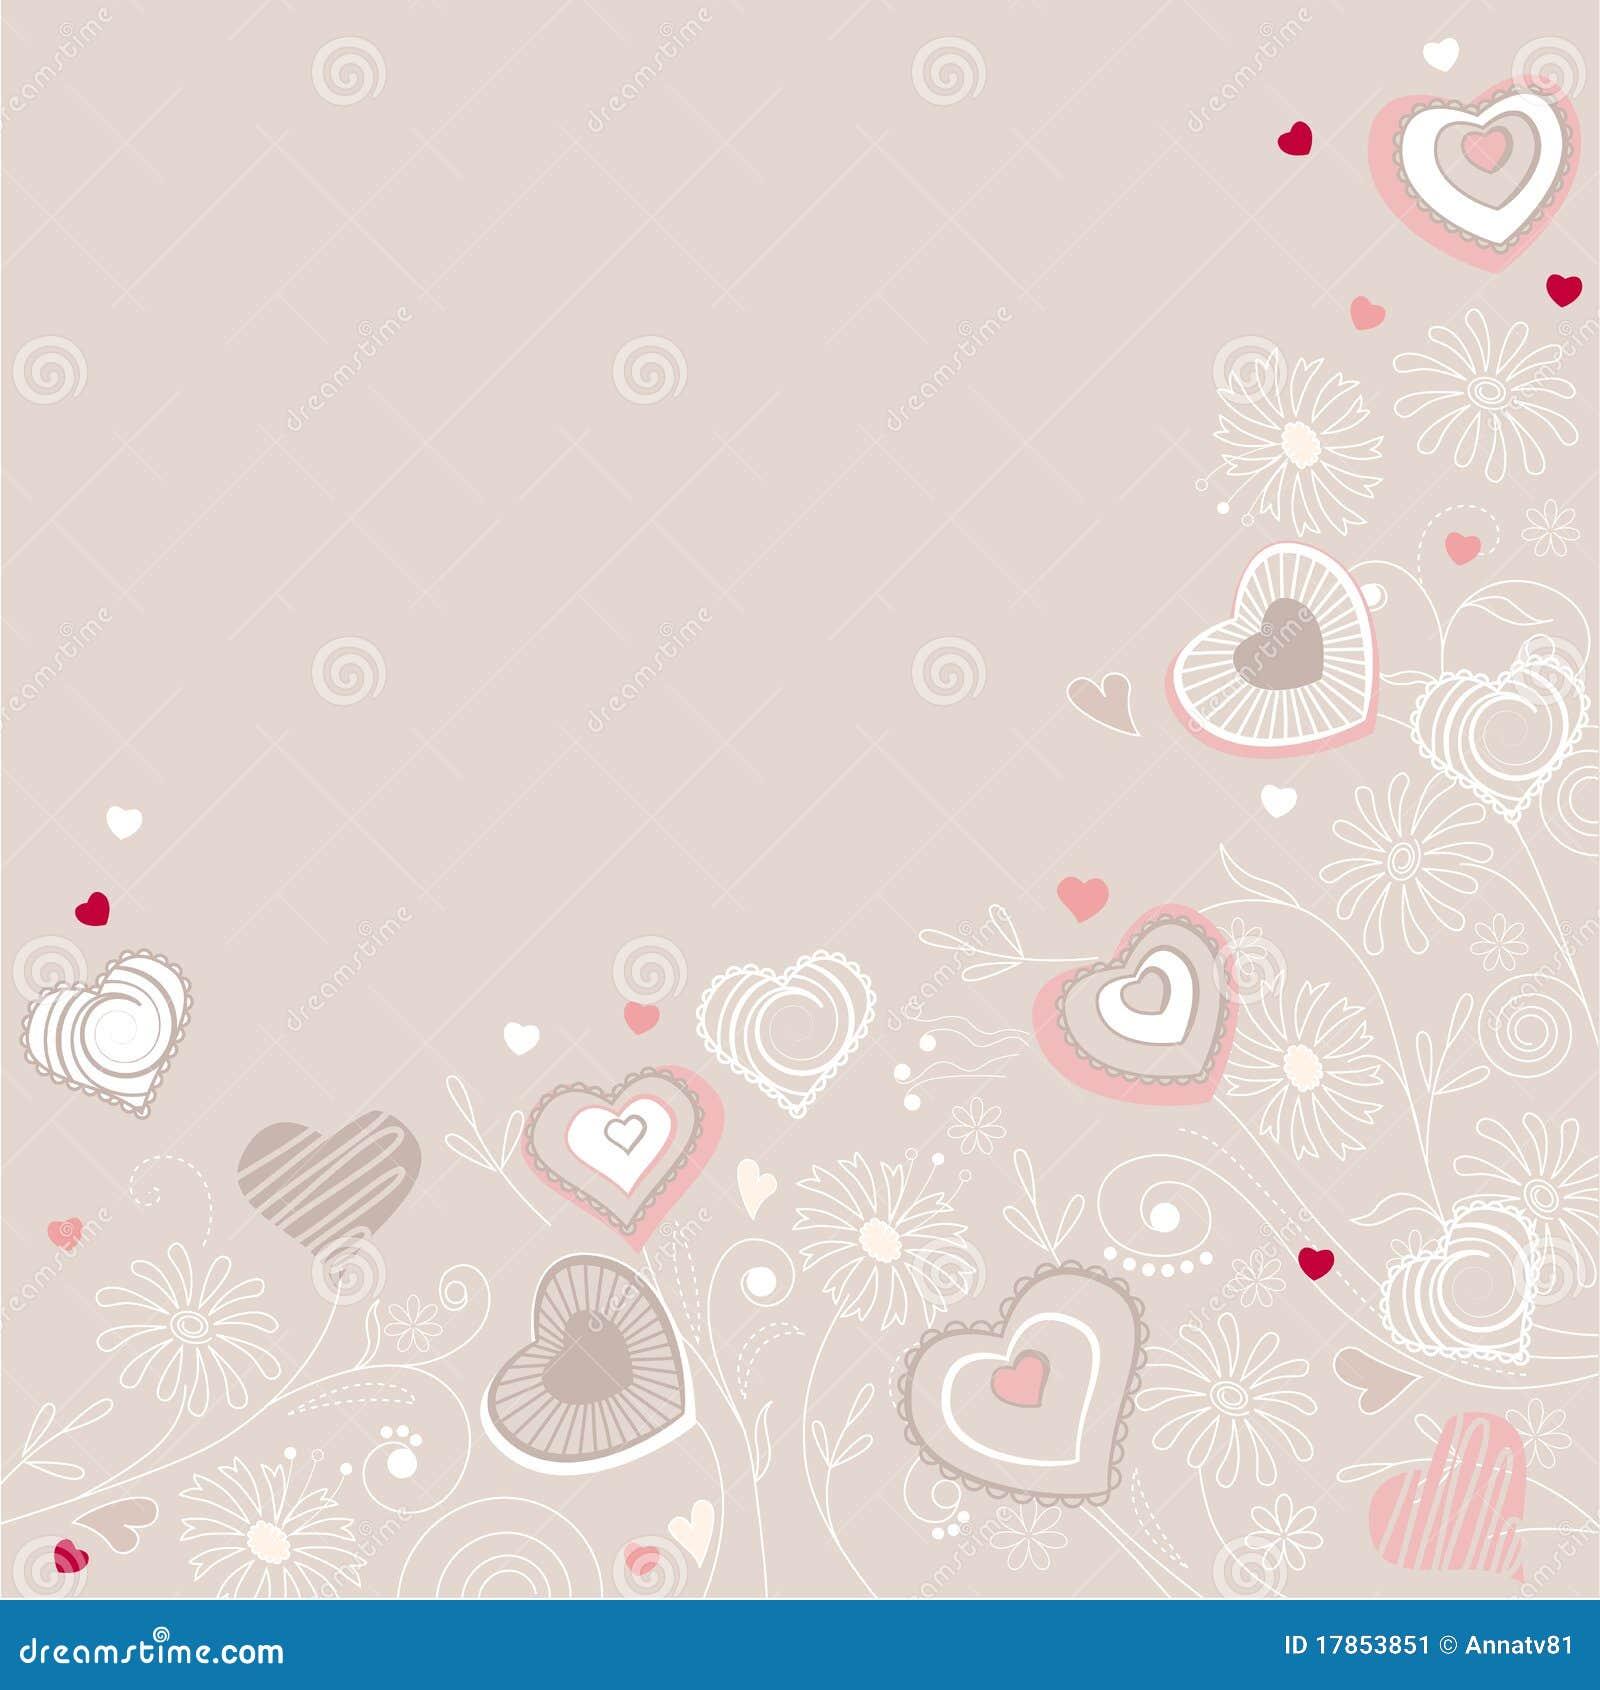 Contour hearts on pastel background